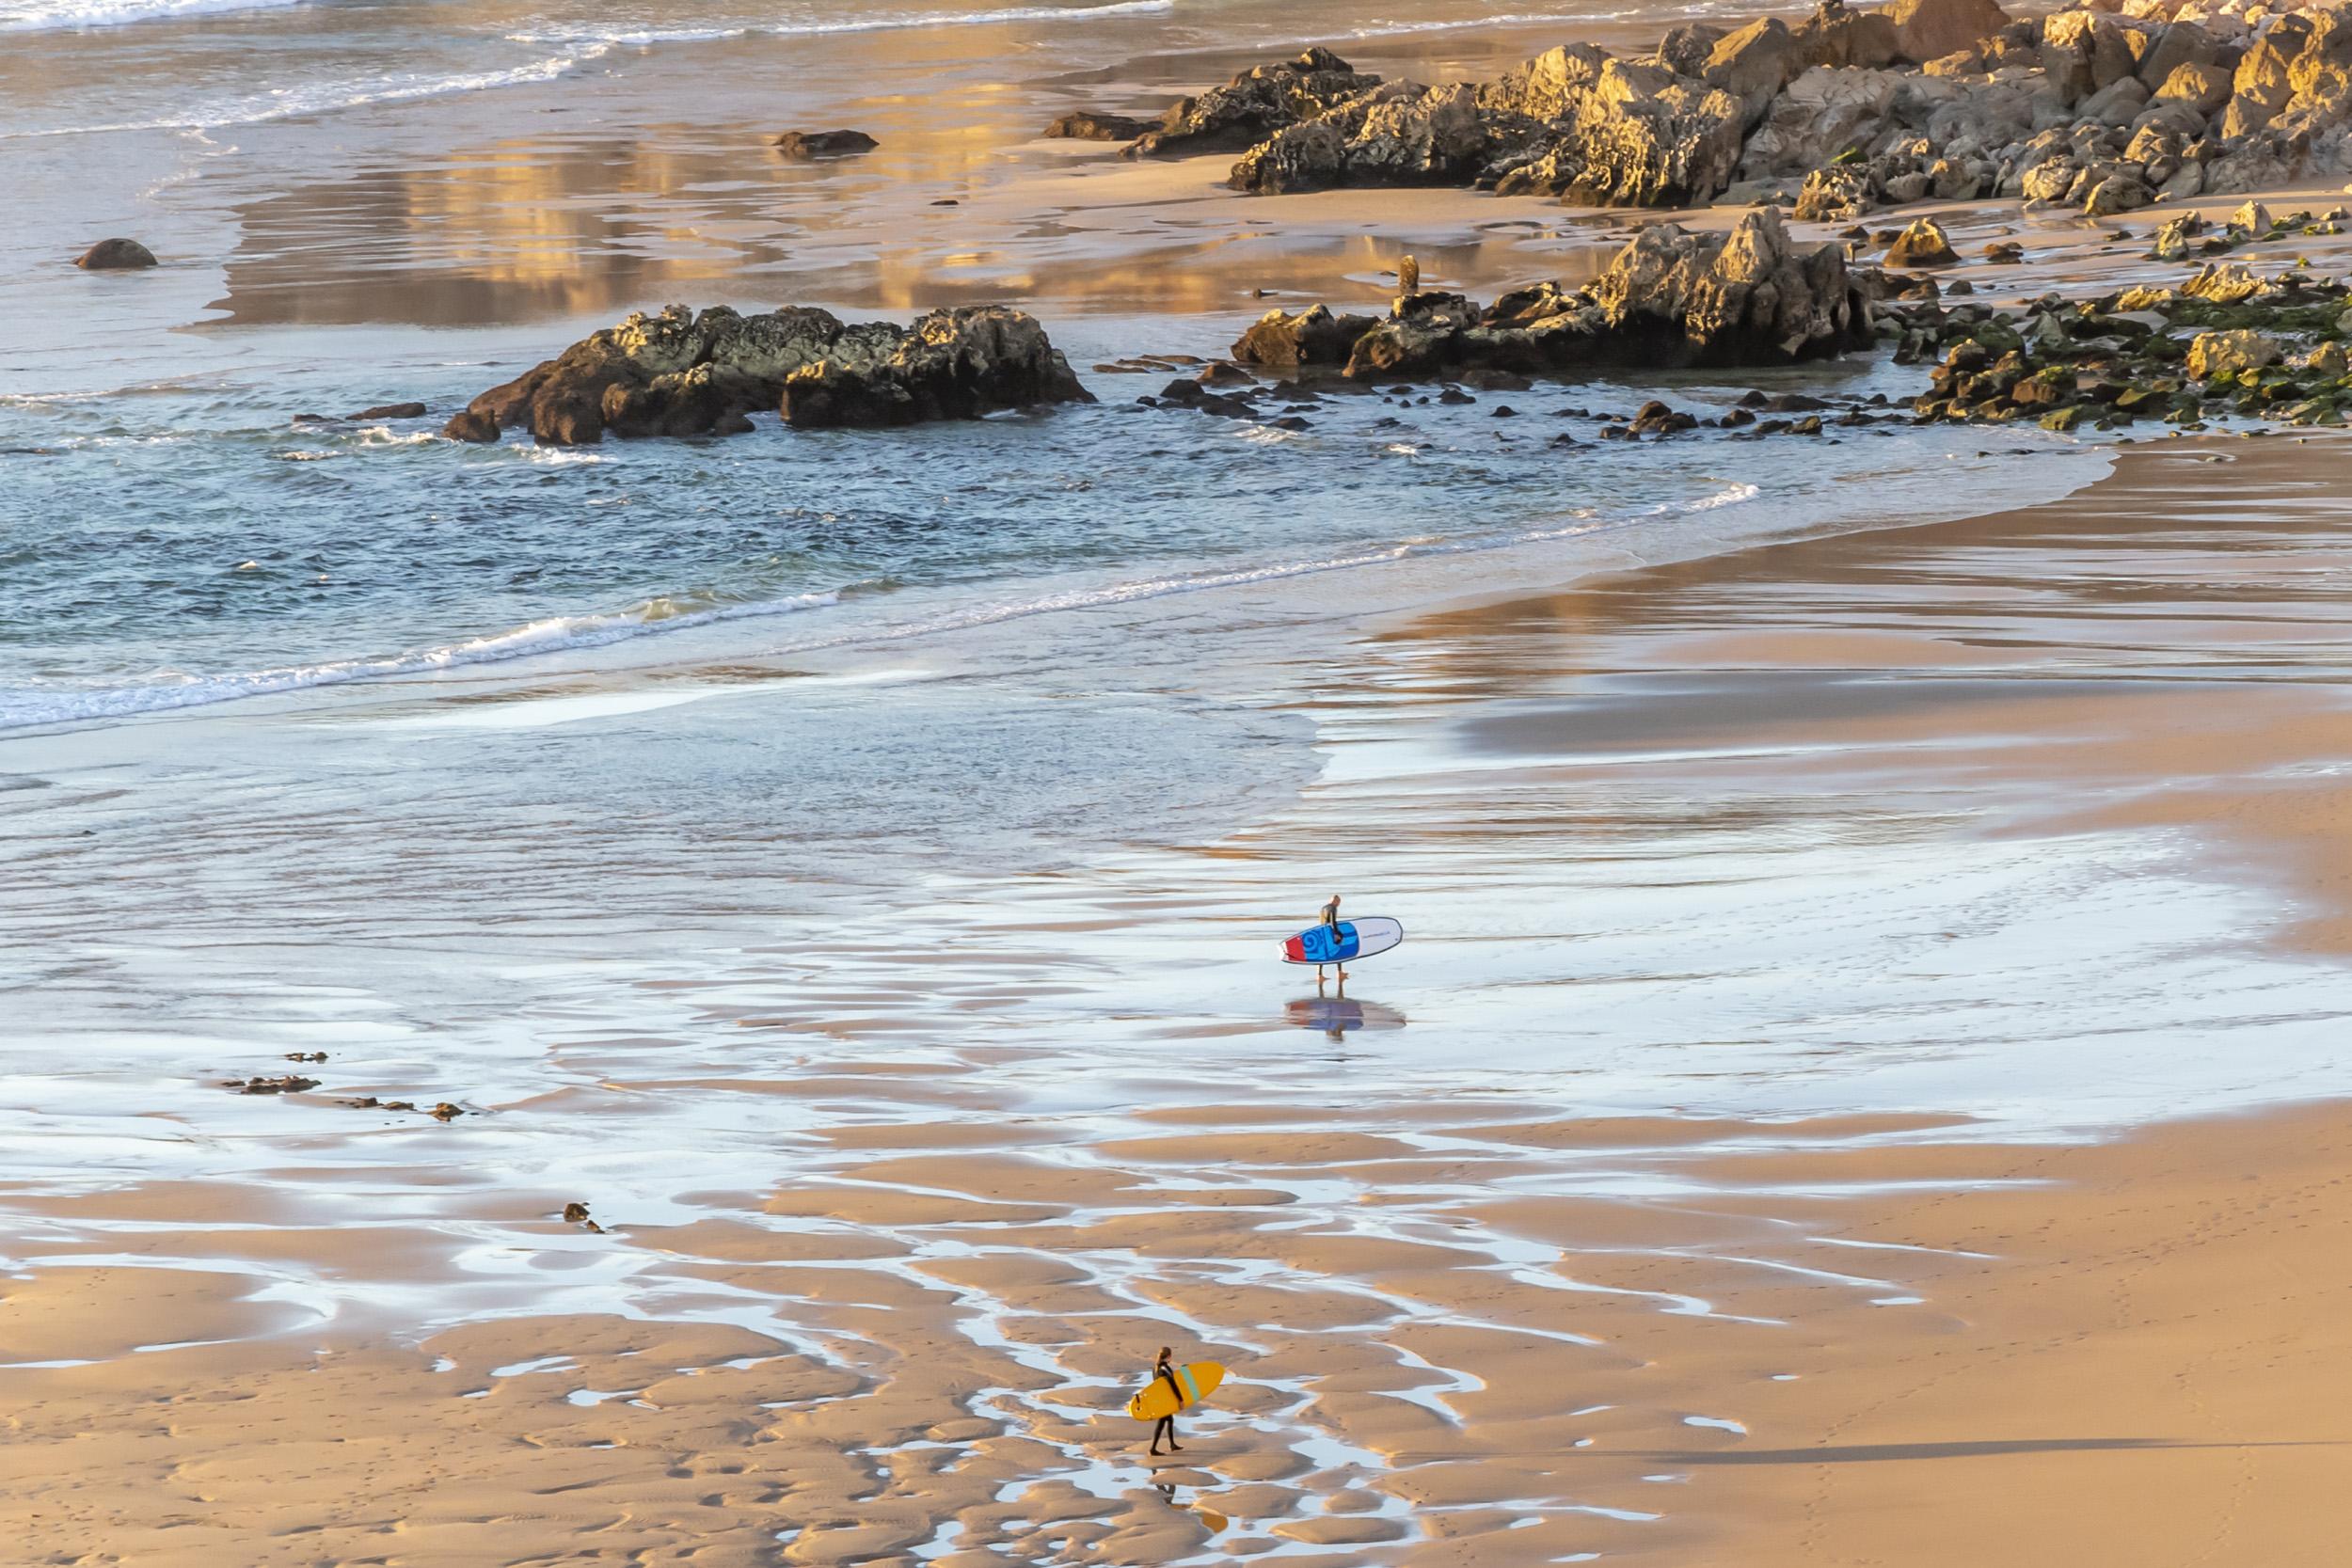 Lagos Surfers